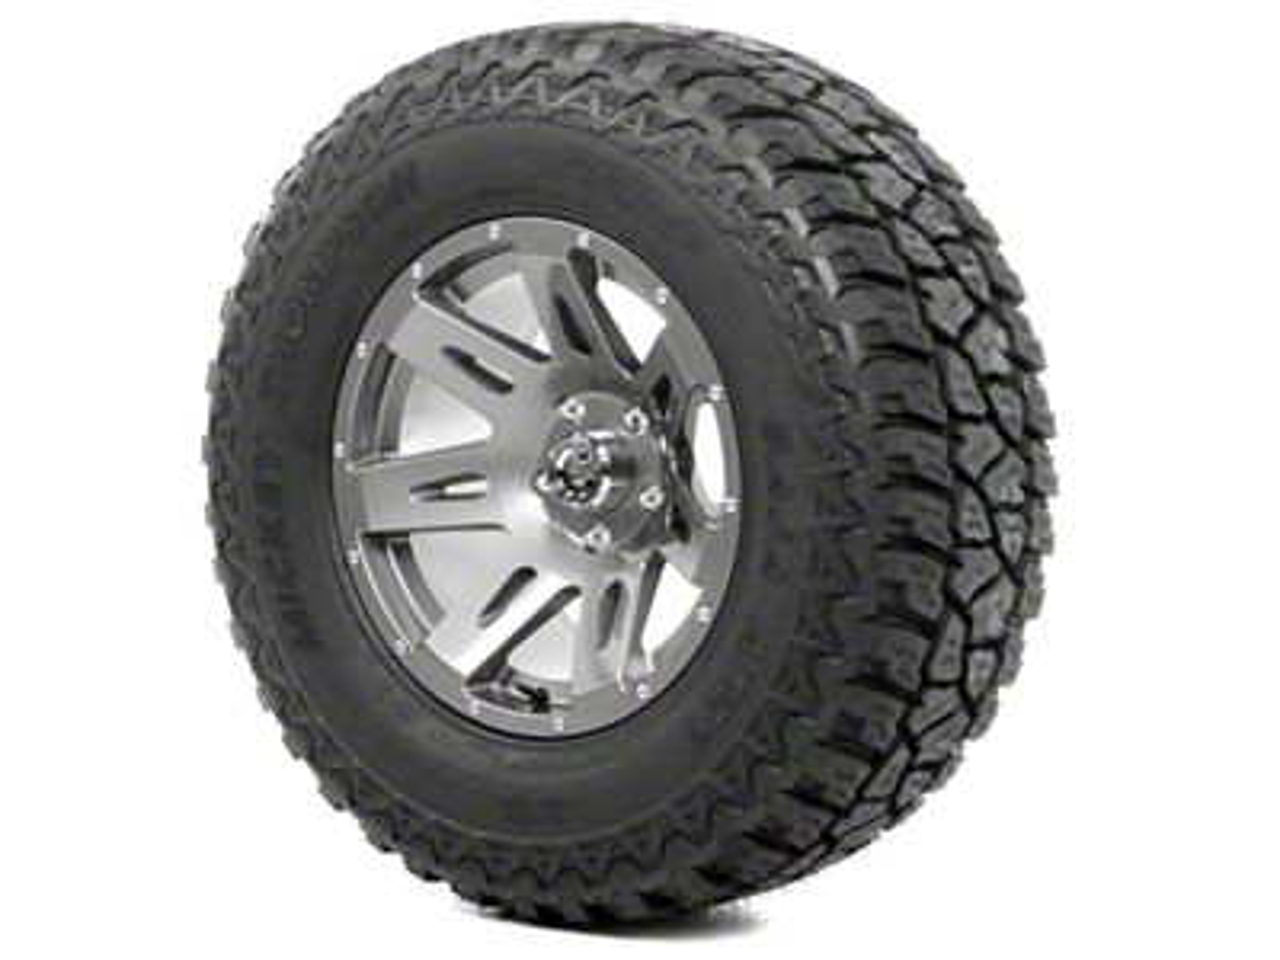 Rugged Ridge XHD Wheel 17x9 Gun Metal and Mickey Thompson ATZ P3 315/70R17 Tire Kit (07-18 Jeep Wrangler JK)